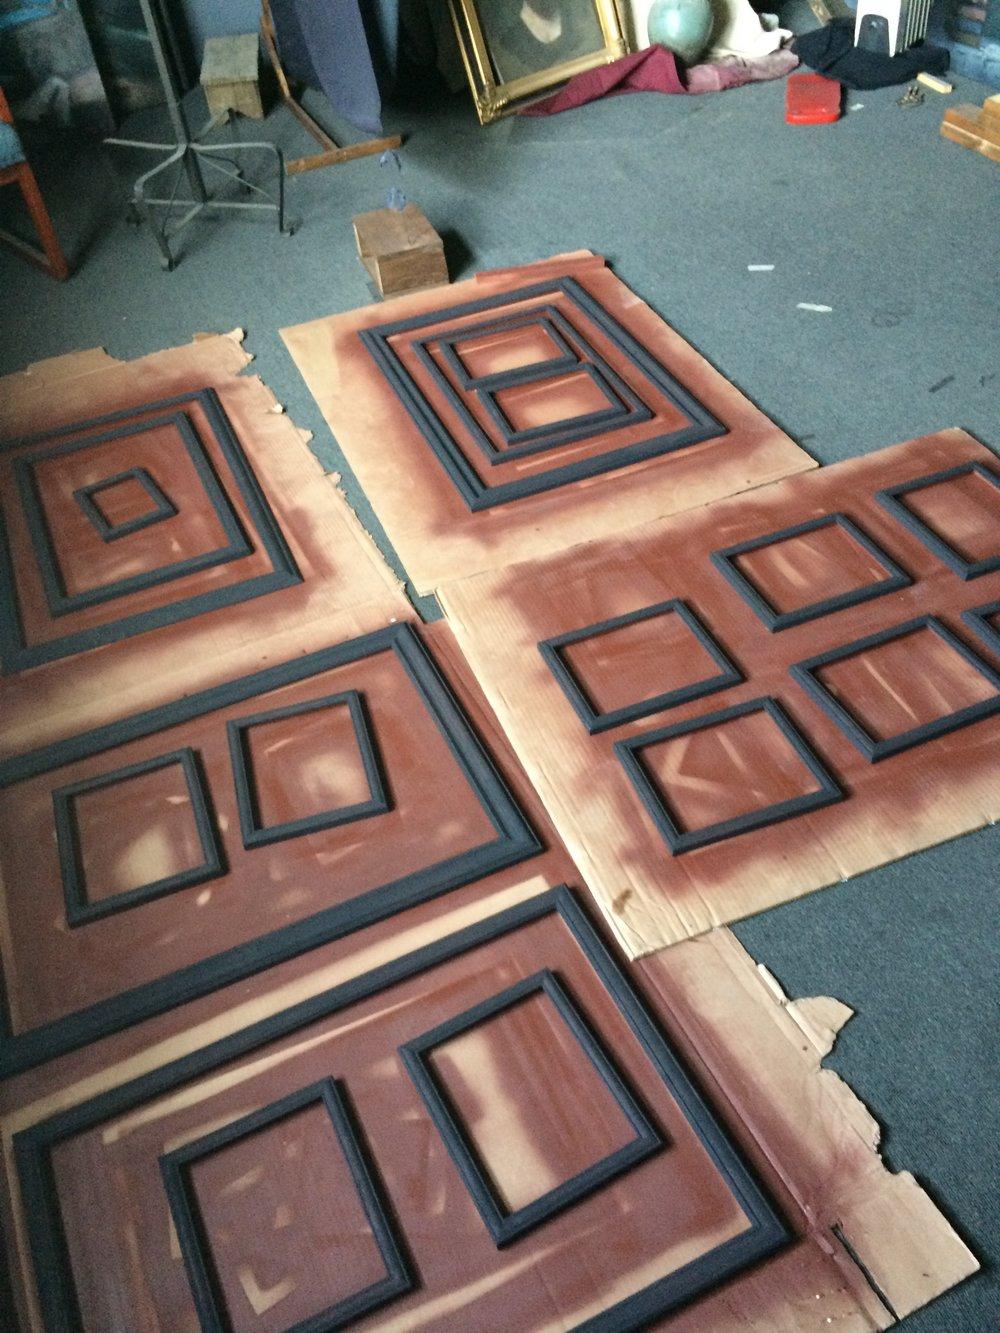 Spending hot summer days sanding and painting frames.